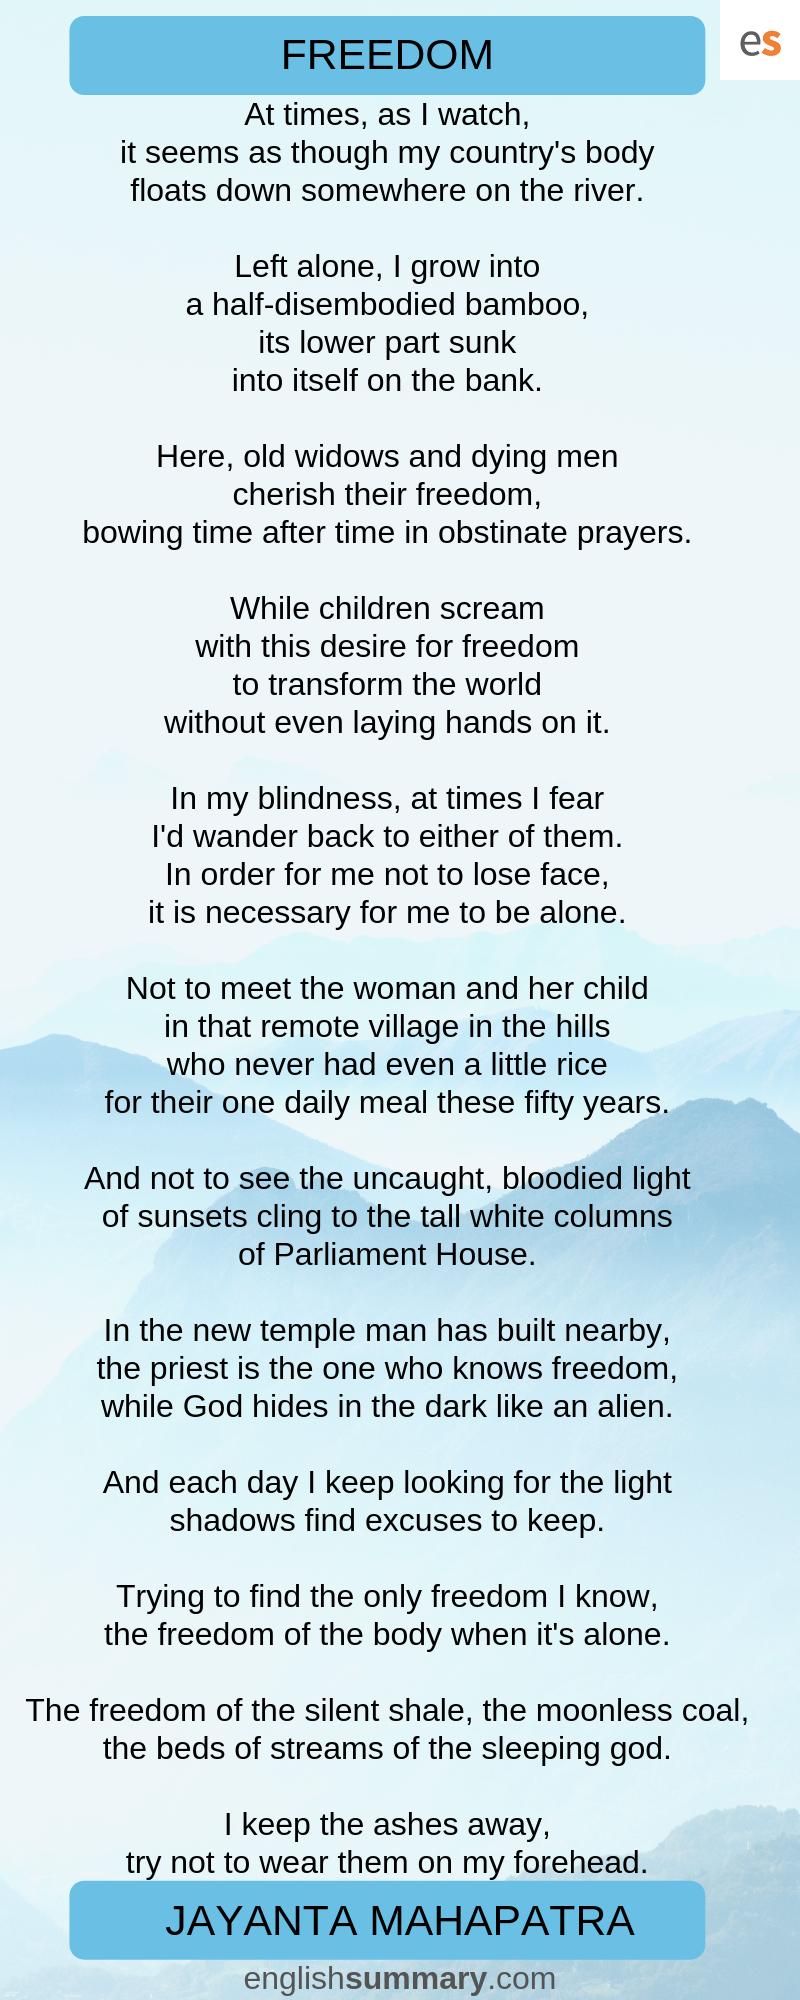 Freedom By Jayanta Mahapatra Poetry Left Alone Theme Of The Good Morrow John Donne